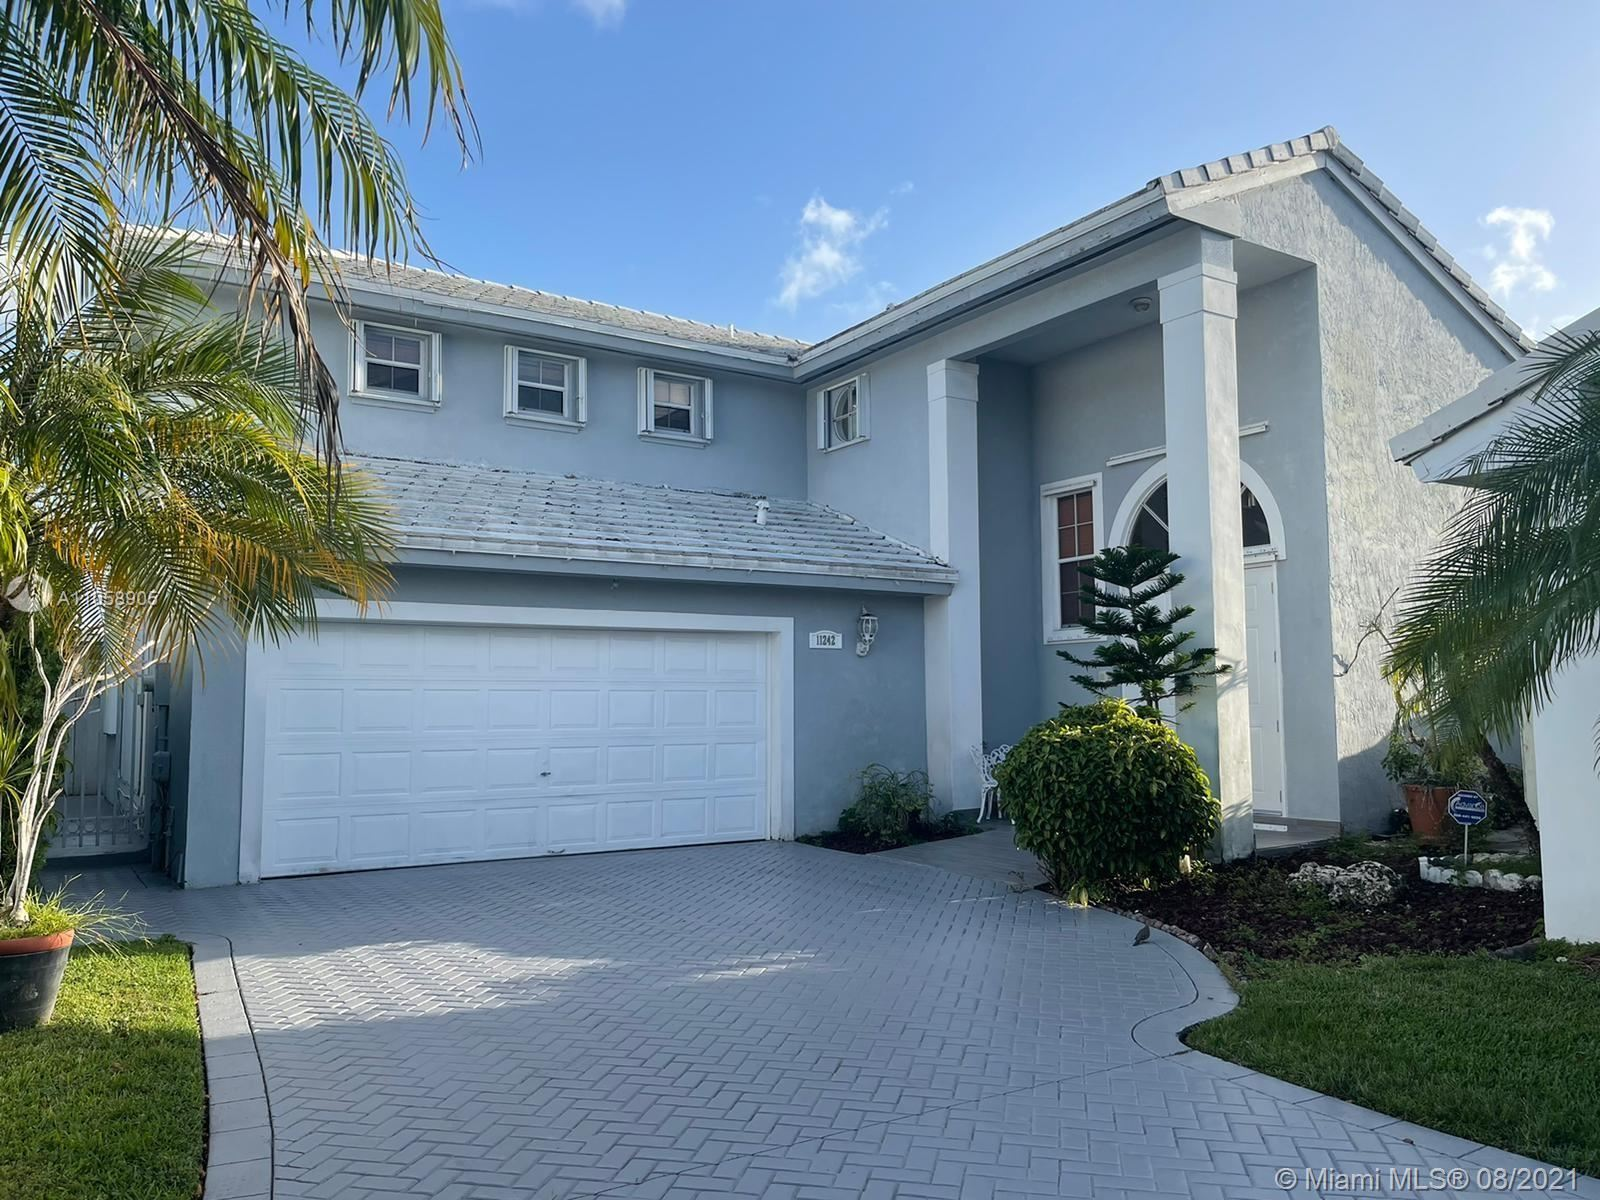 11242 SW 62nd Ln, Miami, FL 33173 - #: A11058905